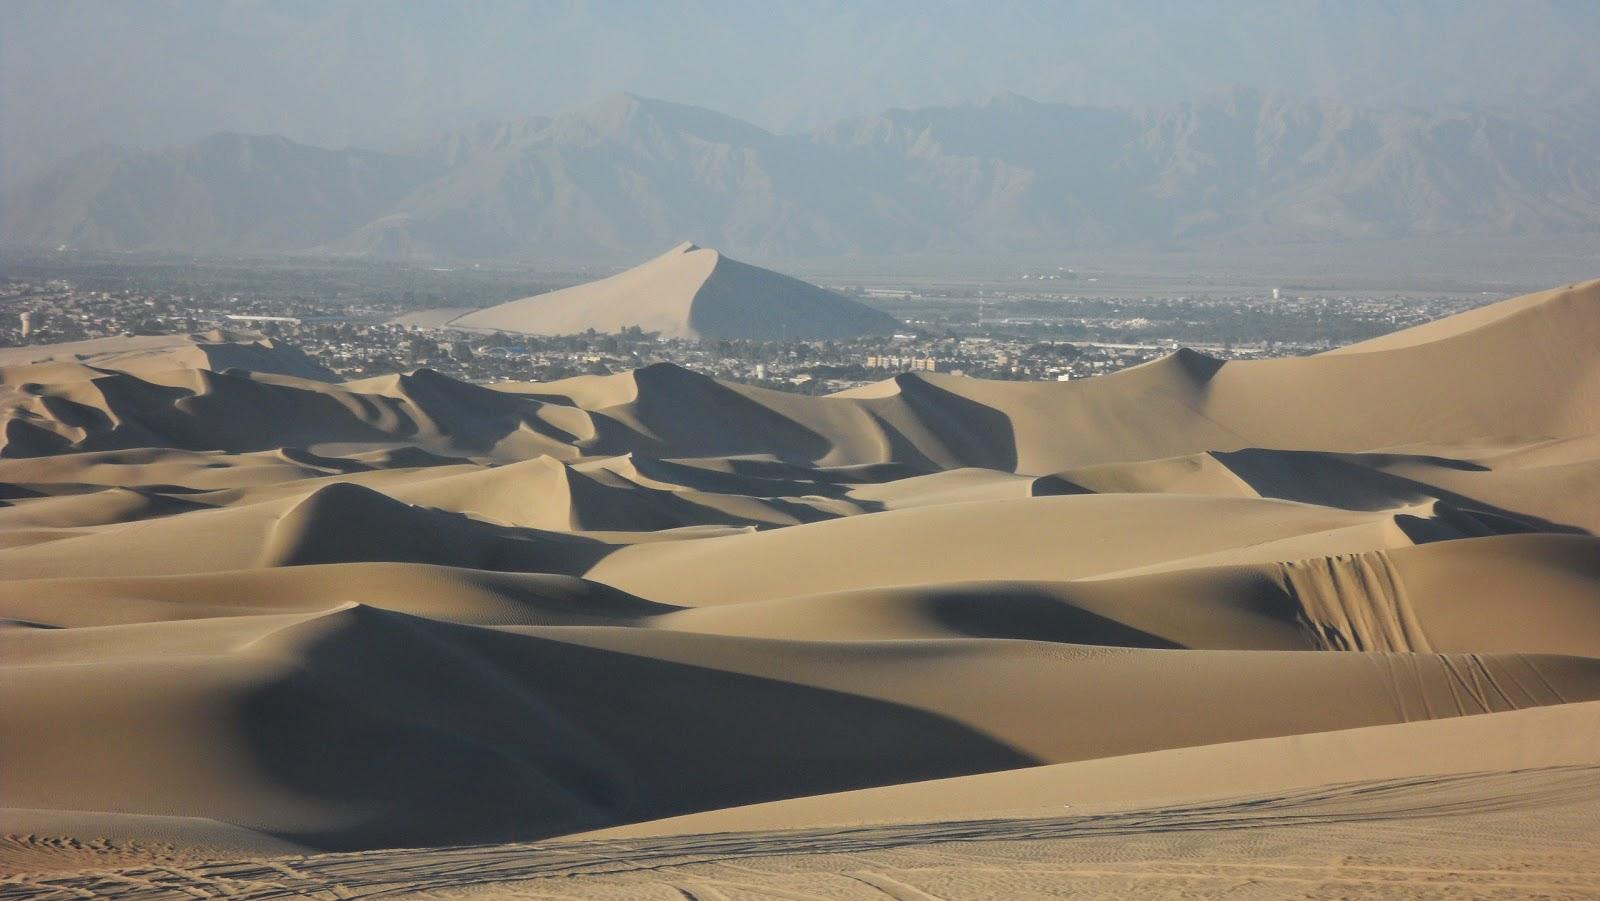 Desierto, Dunas, Formas, Sombras